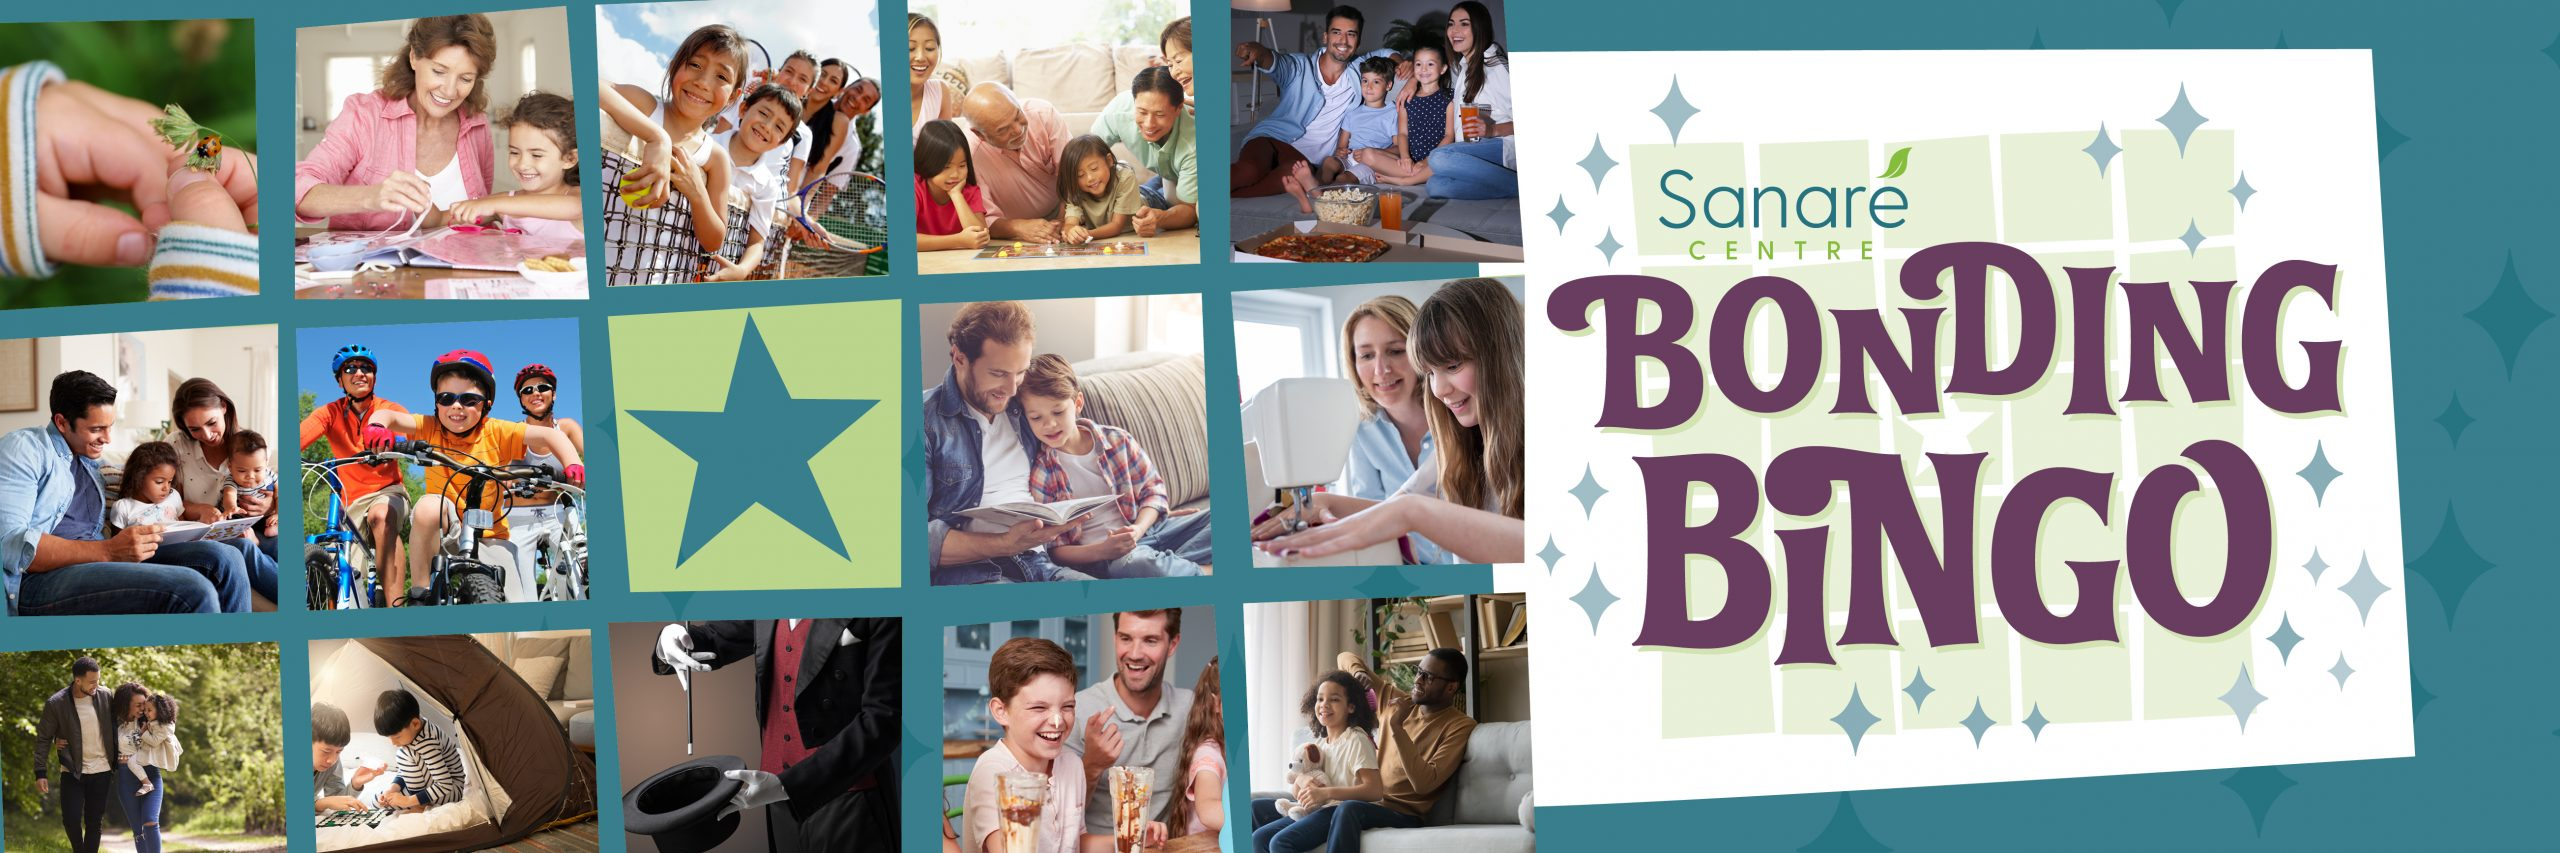 Bonding Bingo Header with photos of family activities